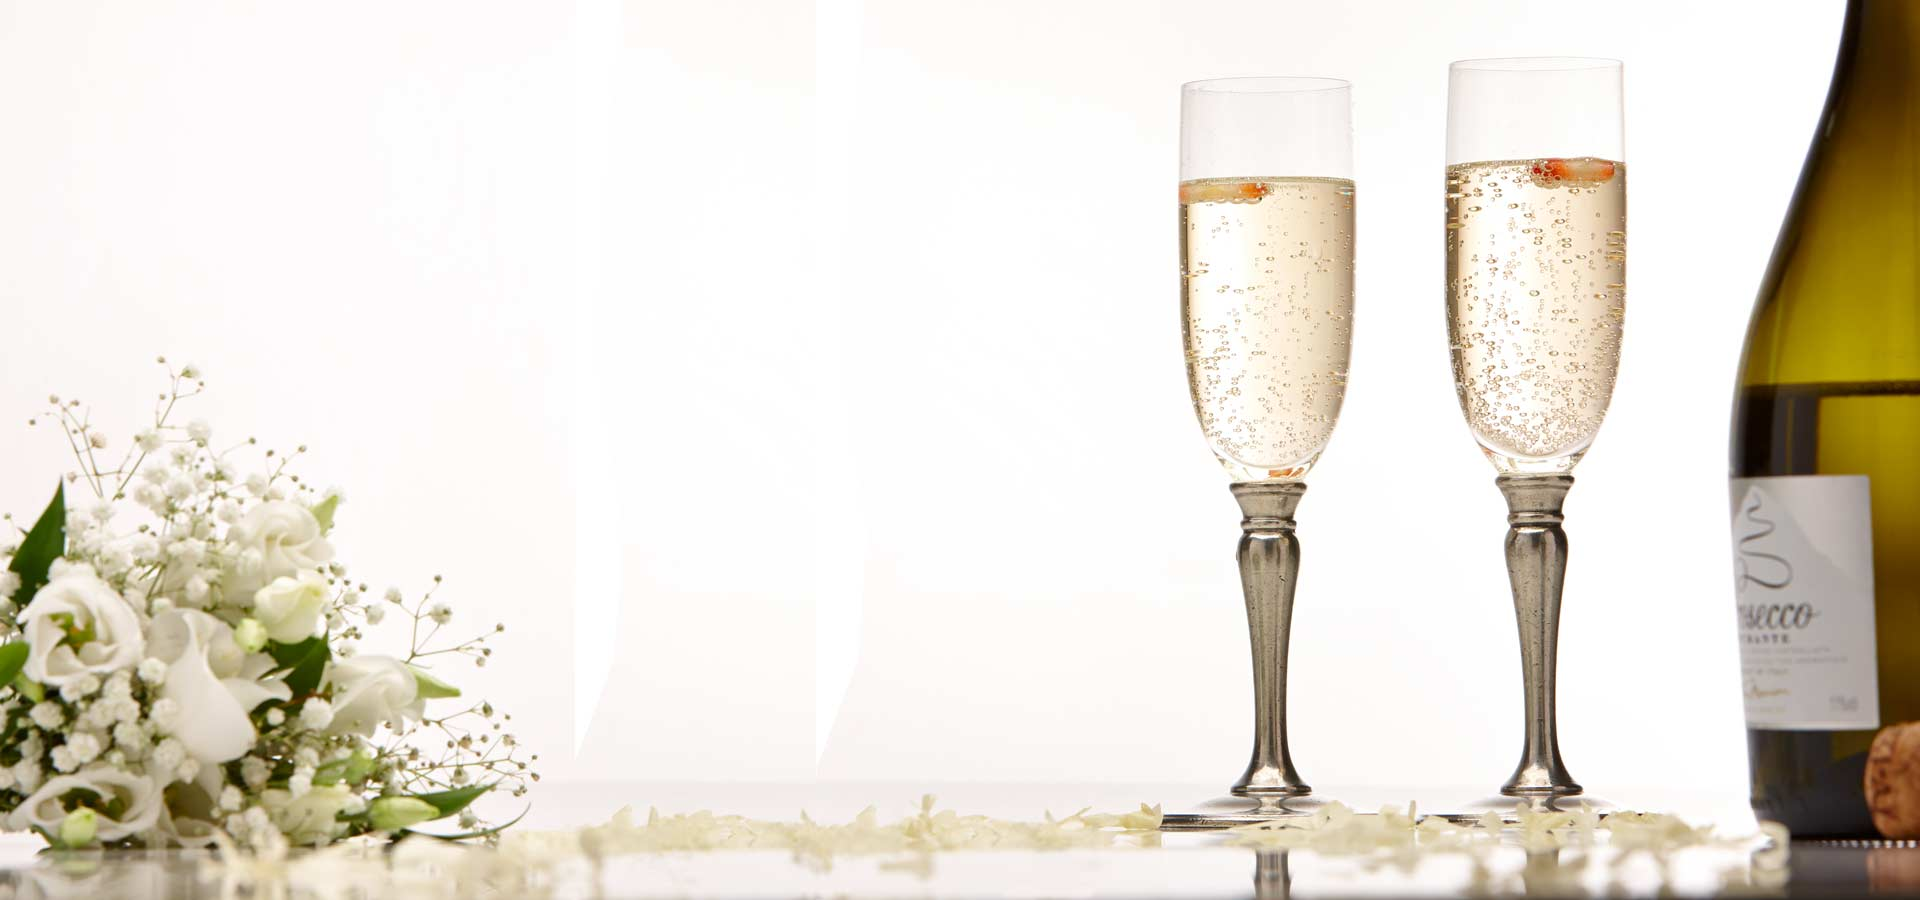 bicchieri, calici